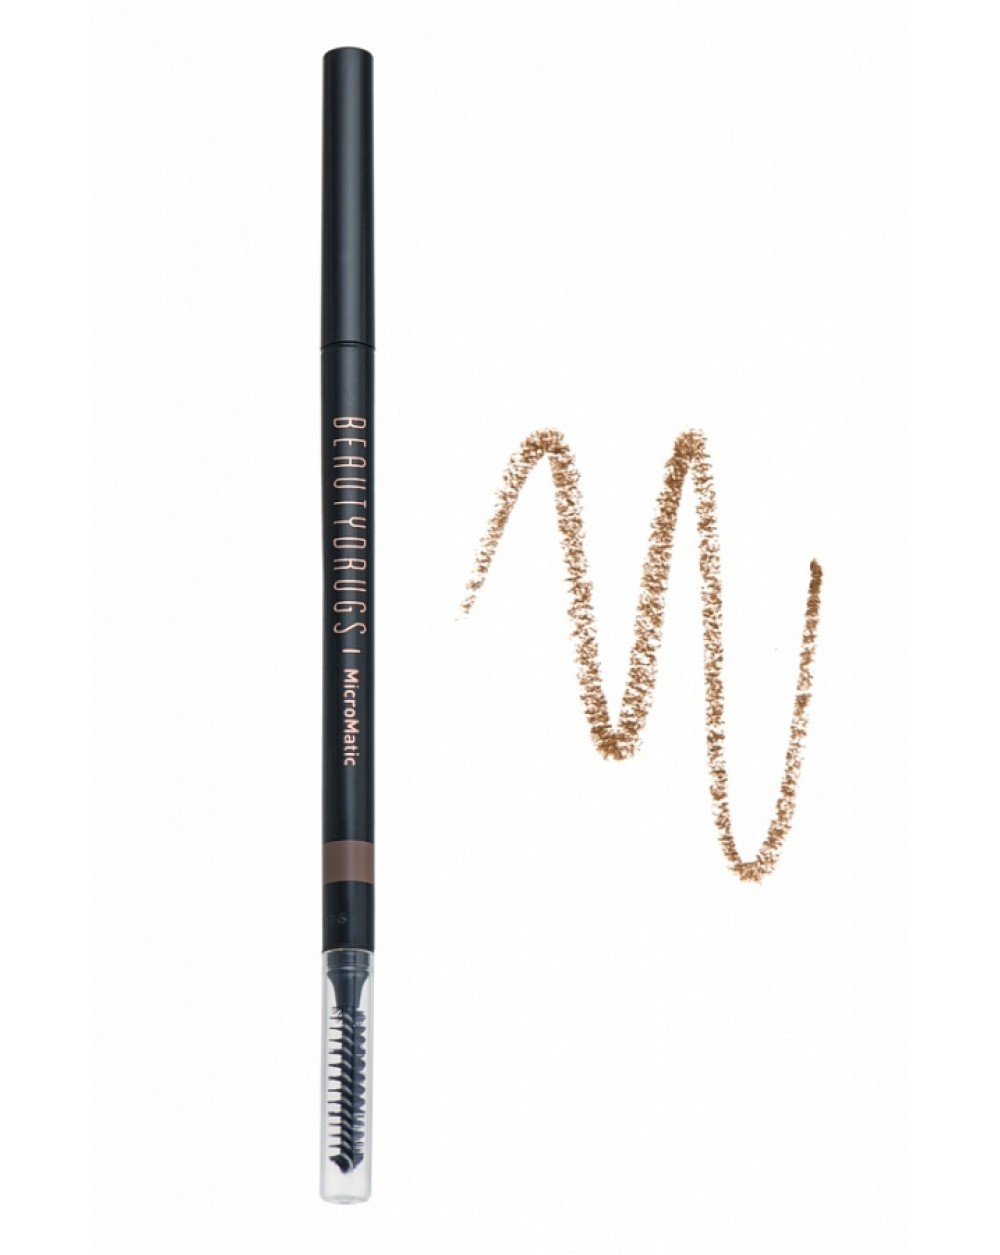 Карандаш для бровей BEAUTYDRUGS MicroMatic оттенок Brunette, 0,09 карандаш для губ beautydrugs insomnia mister tint оттенок 04